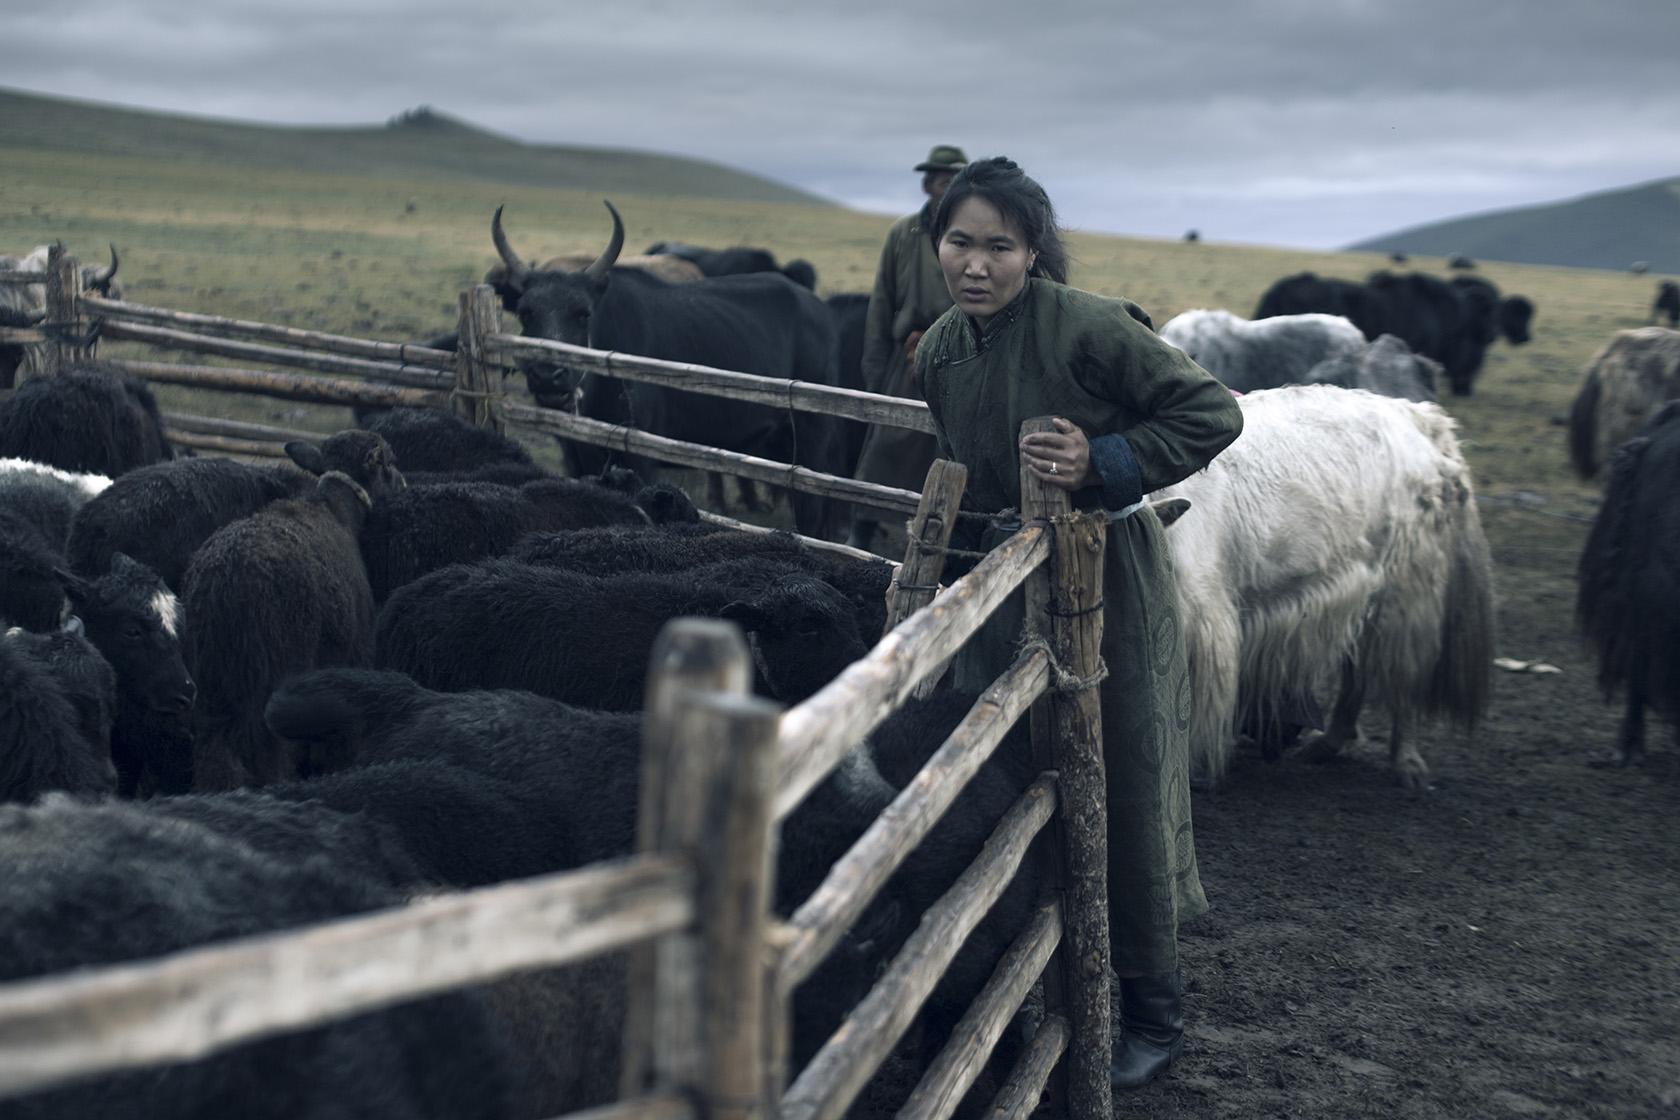 Tengri_Mongolian_woman_herder.jpg